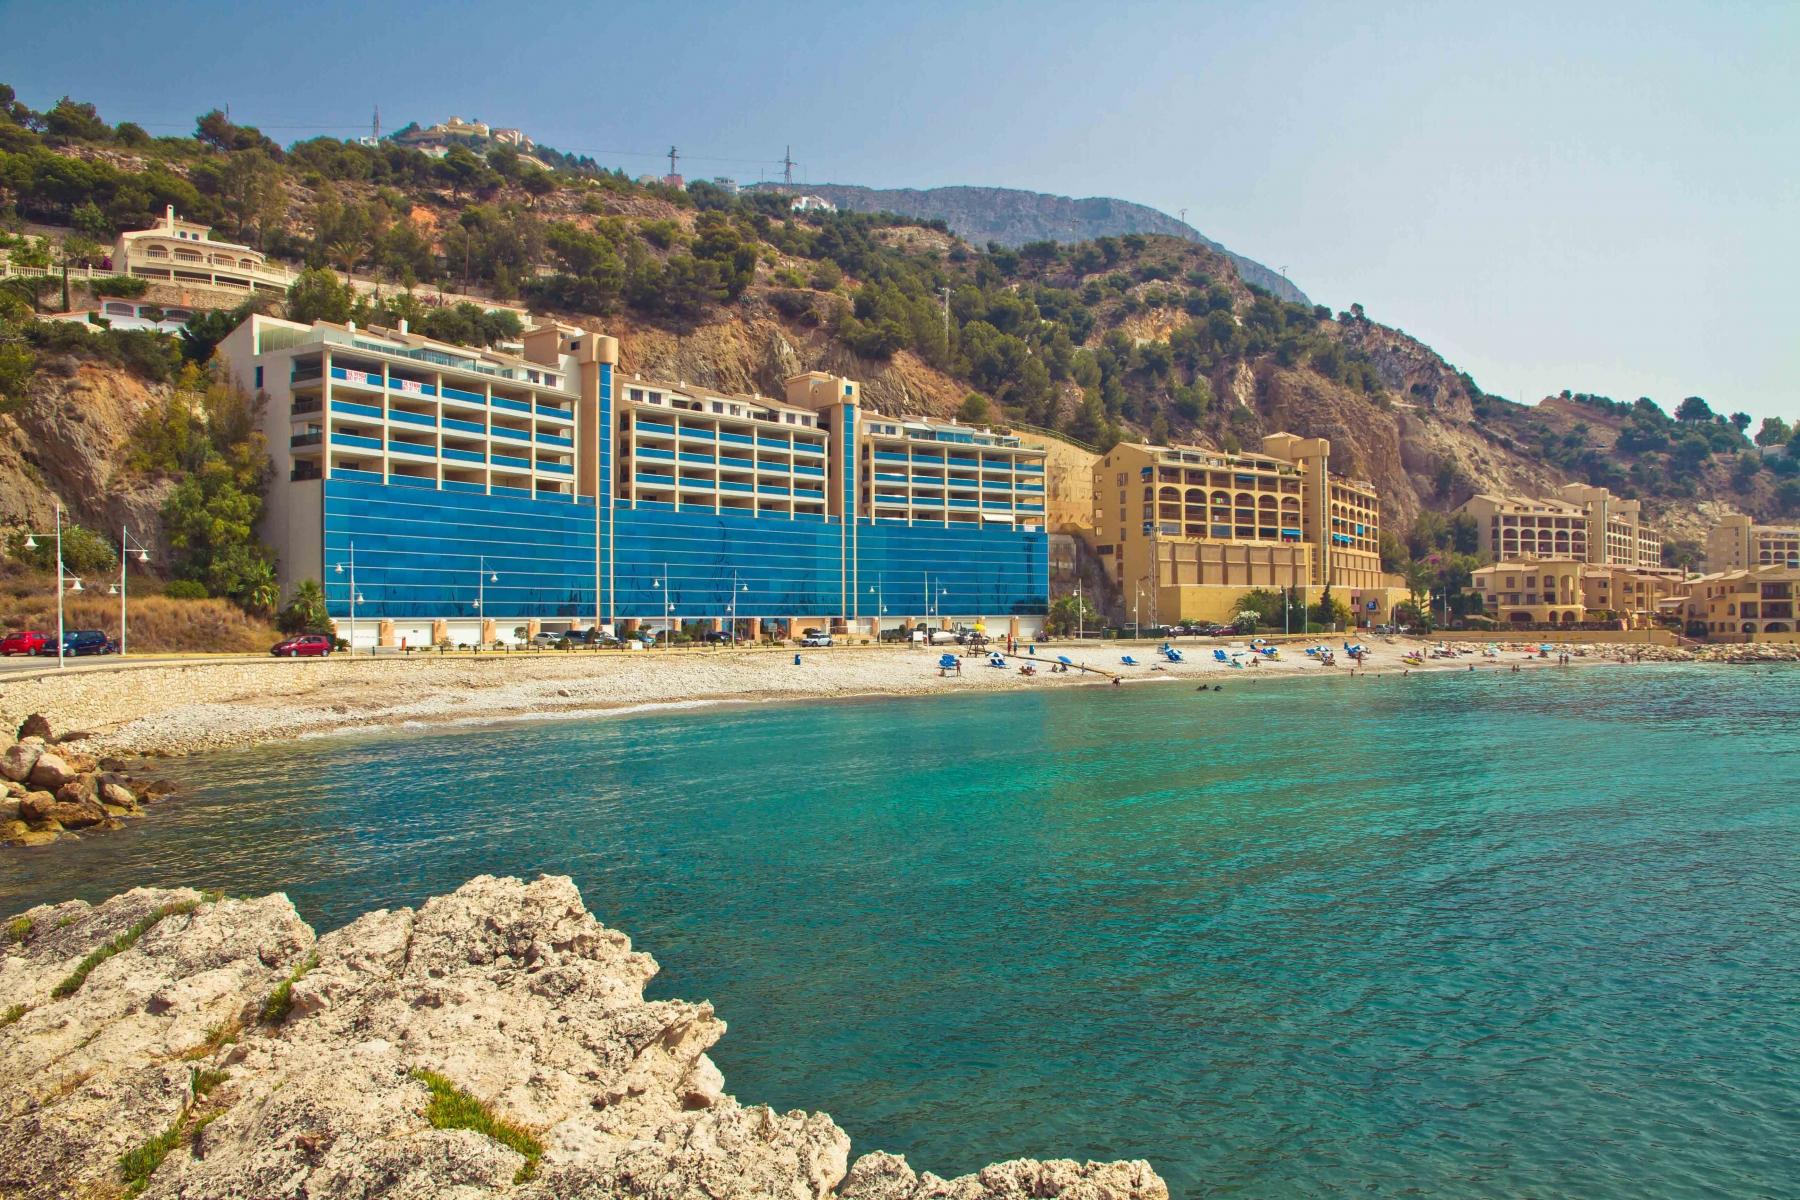 Top vakantiehuisje Spaanse Middellandse Zee 🏕️Pierre & Vacances Résidence Altea Beach